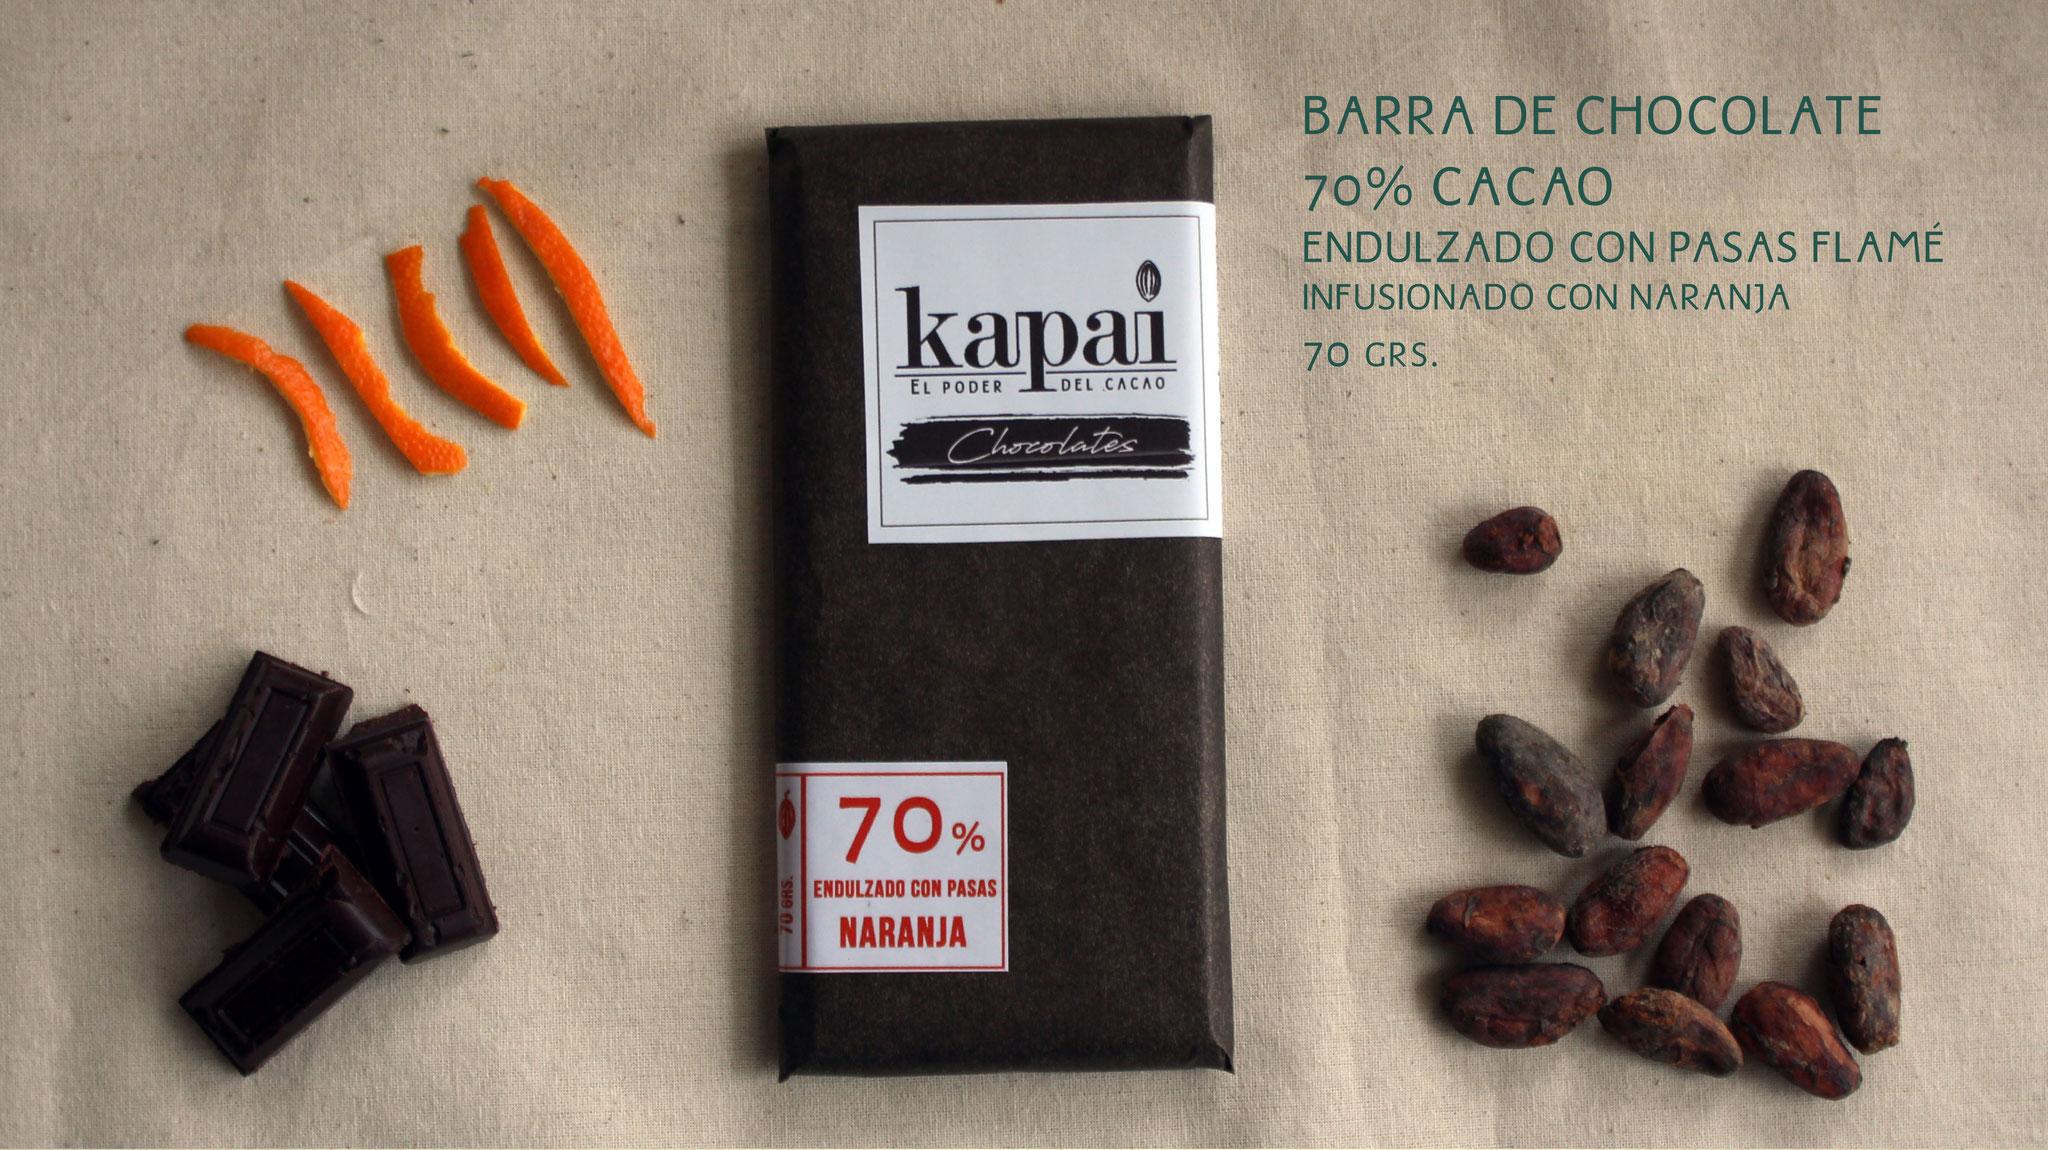 70% Cacao, Pasas Flamé y Naranja